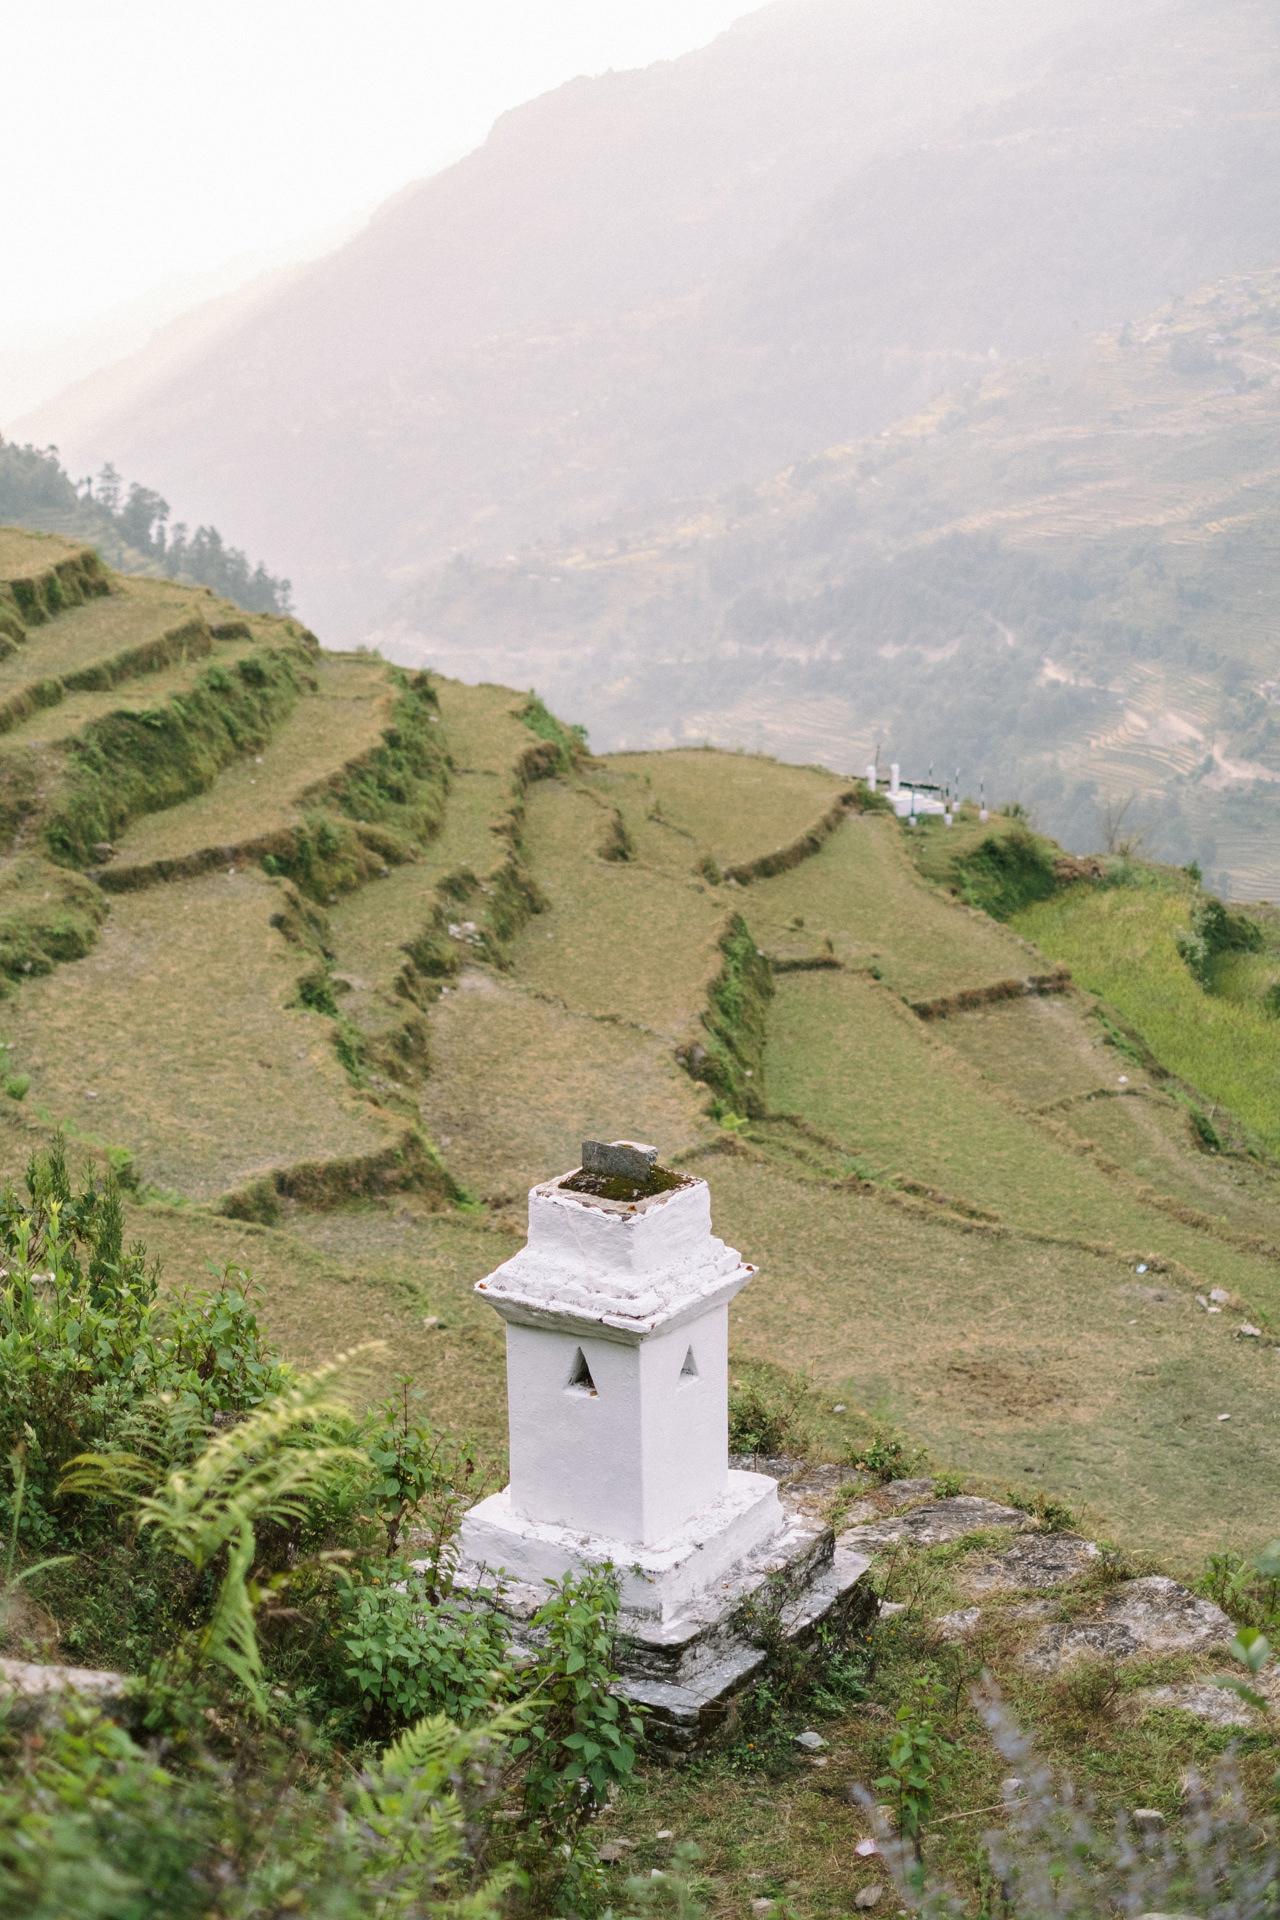 Nepal 2019 - Trekking Annapurna Base Camp 68